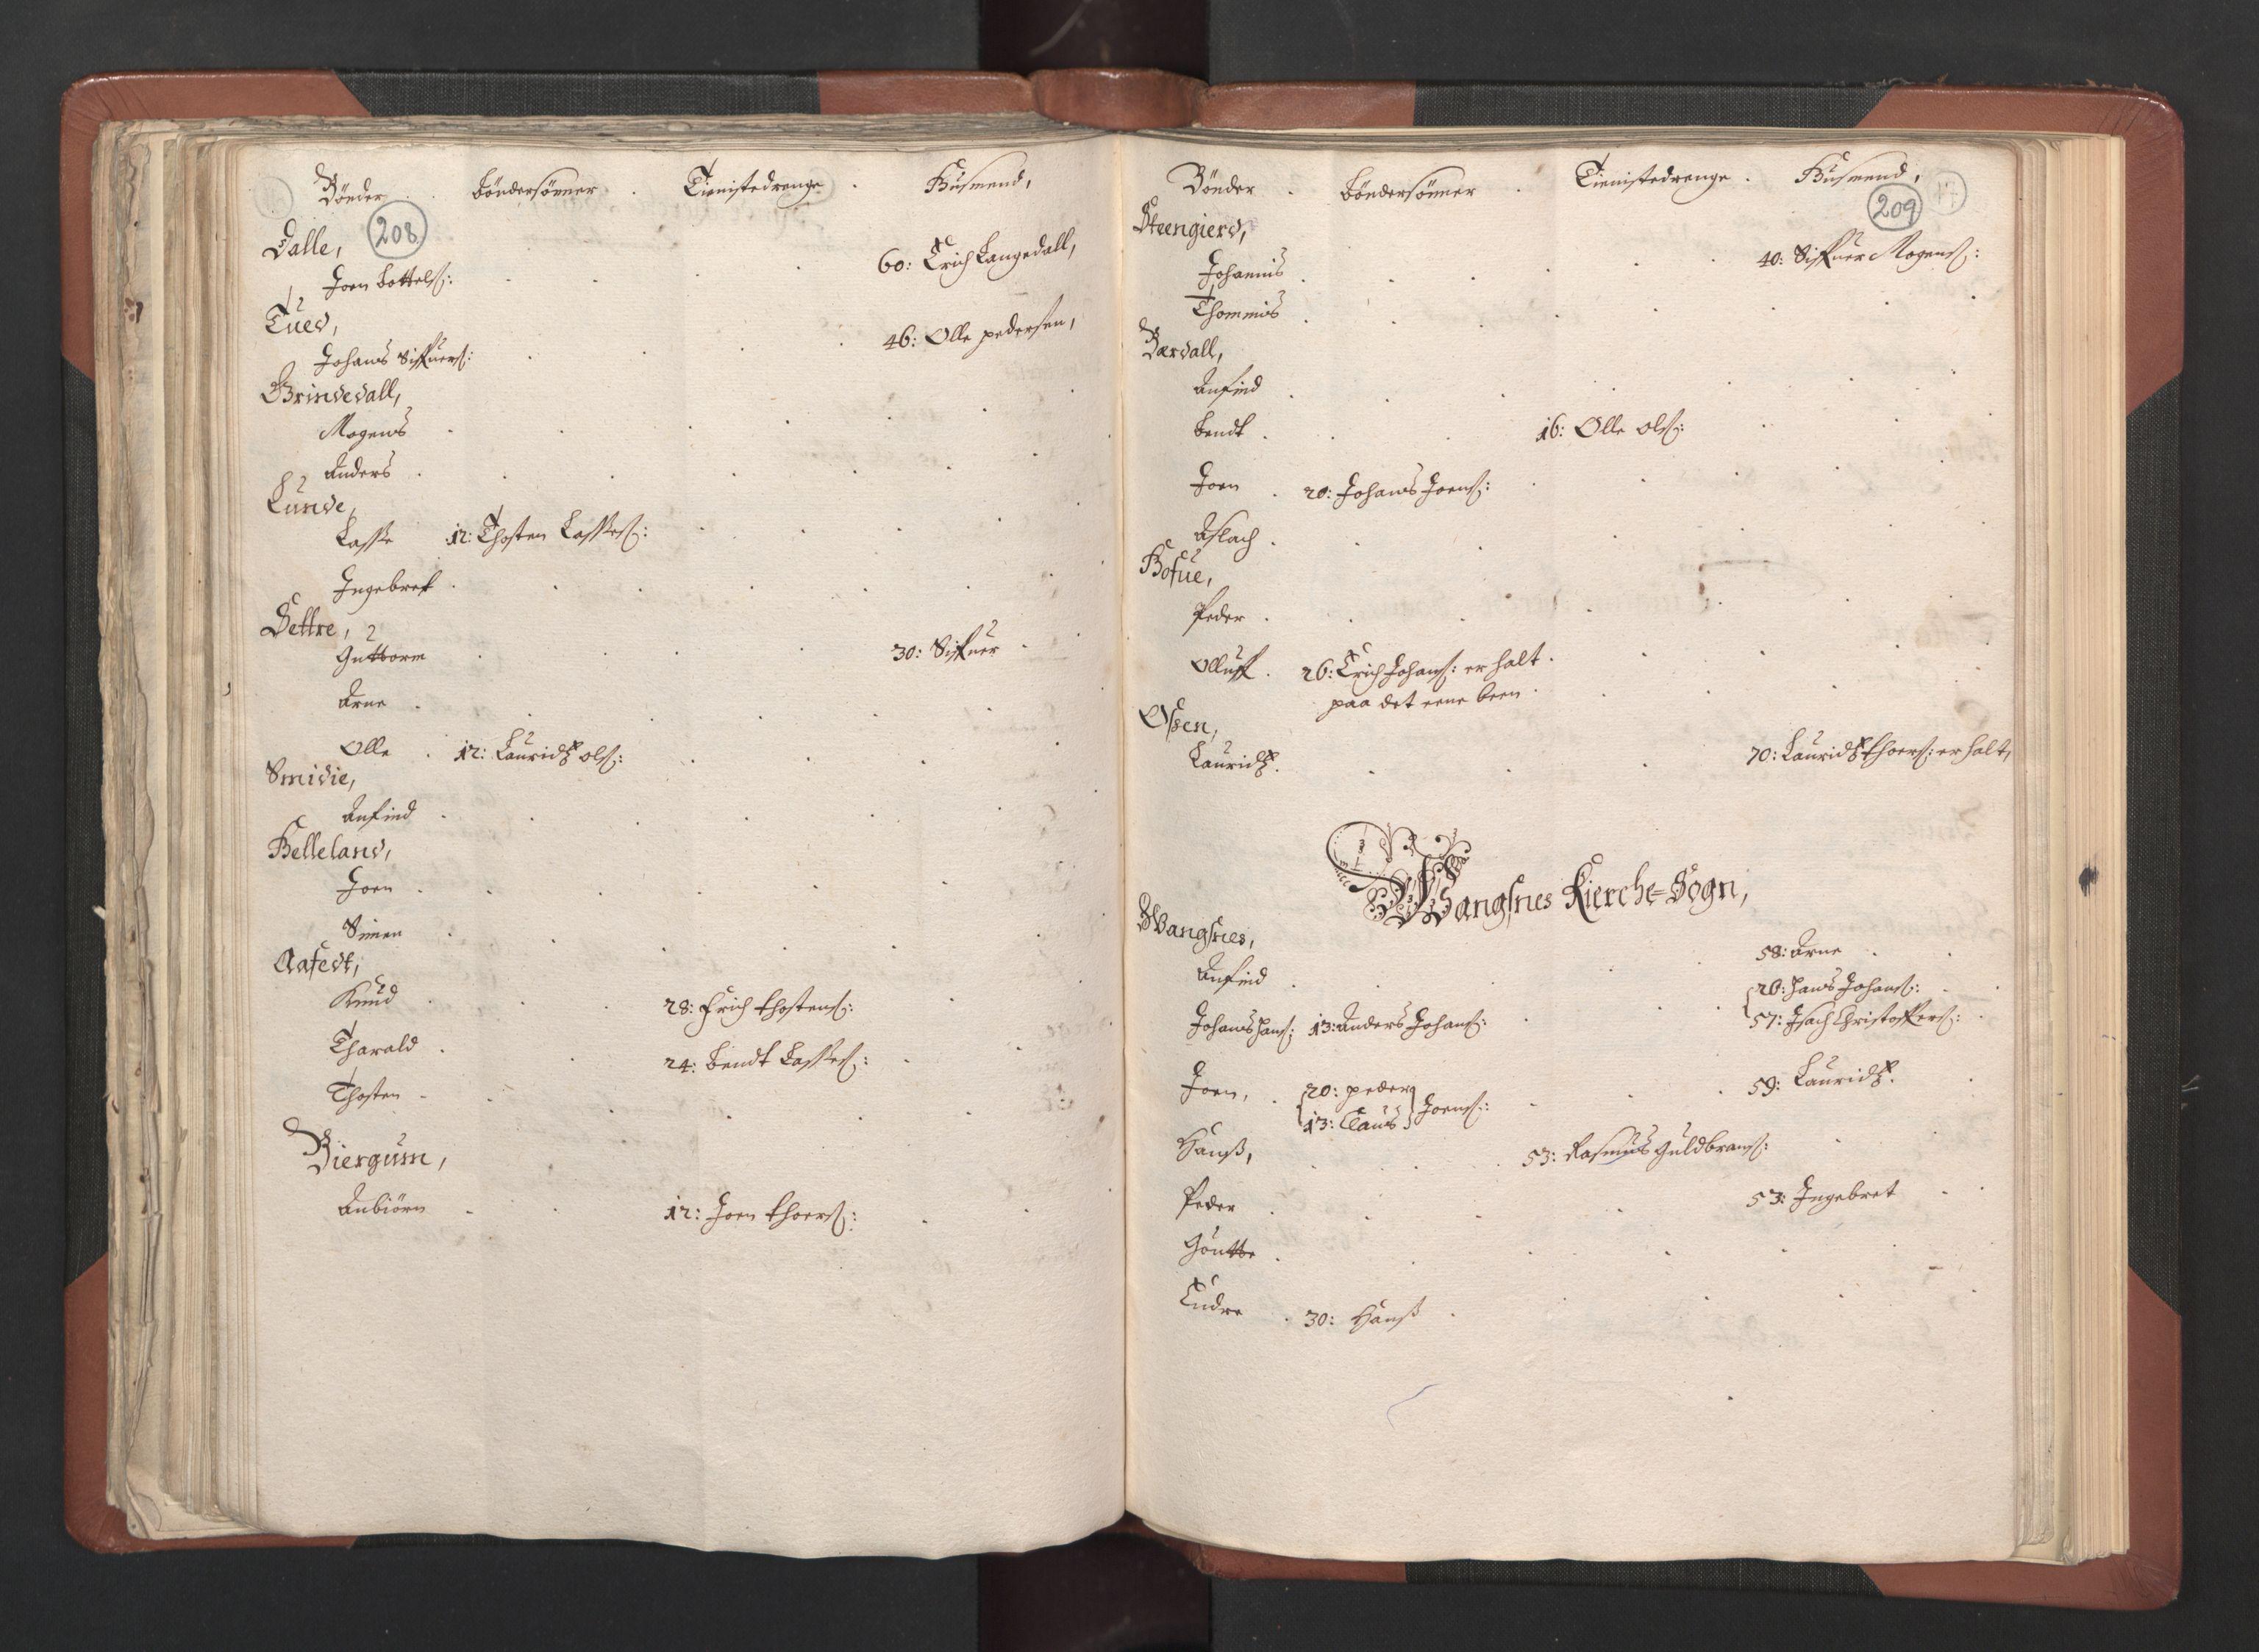 RA, Fogdenes og sorenskrivernes manntall 1664-1666, nr. 14: Hardanger len, Ytre Sogn fogderi og Indre Sogn fogderi, 1664-1665, s. 208-209